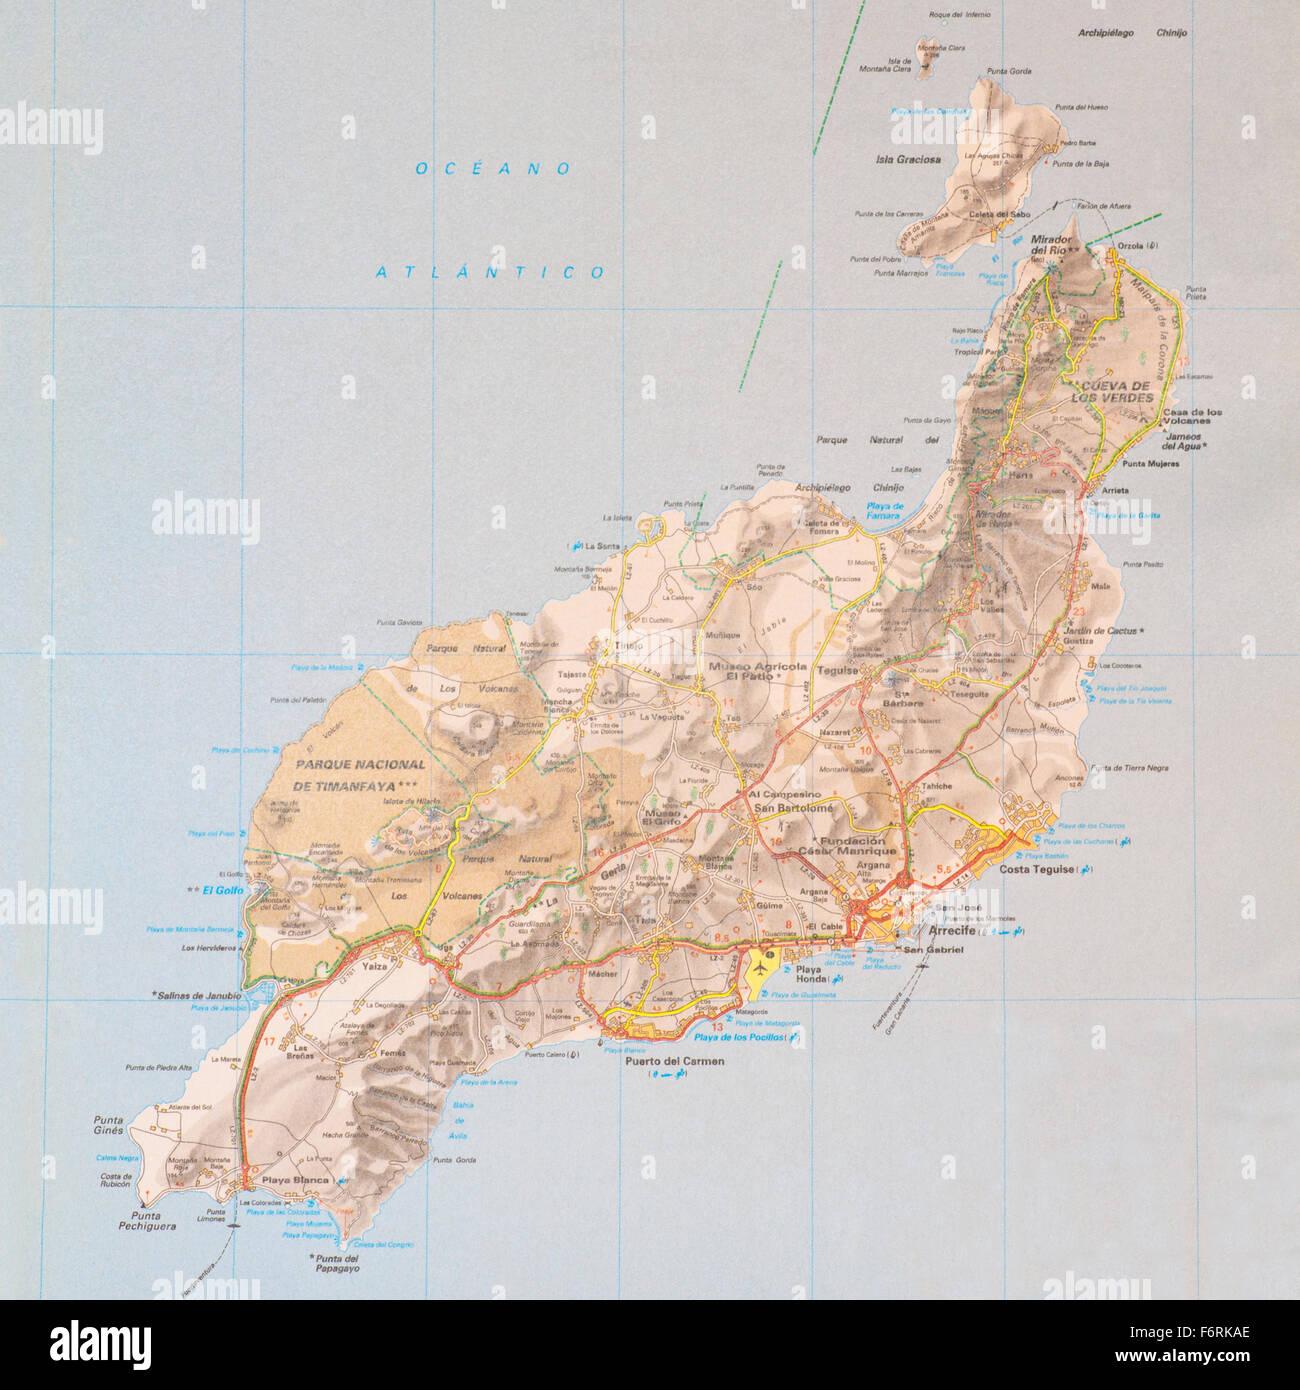 Spagna E Isole Canarie Cartina Geografica.Mappa Di La Spagna Isole Canarie Di Lanzarote Foto Stock Alamy